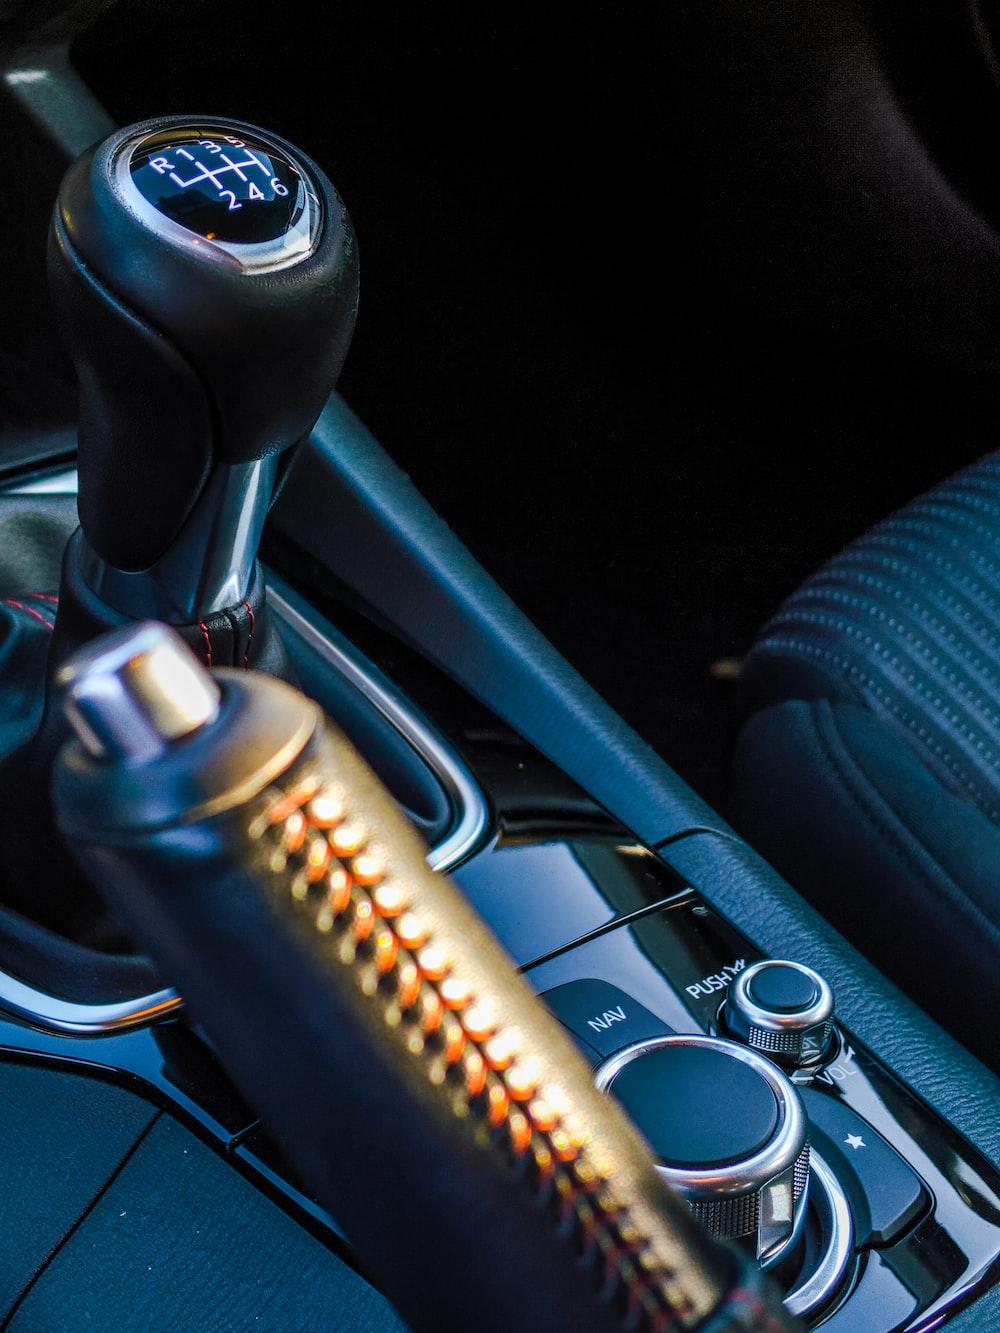 closeup photo of vehicle gear shift lever